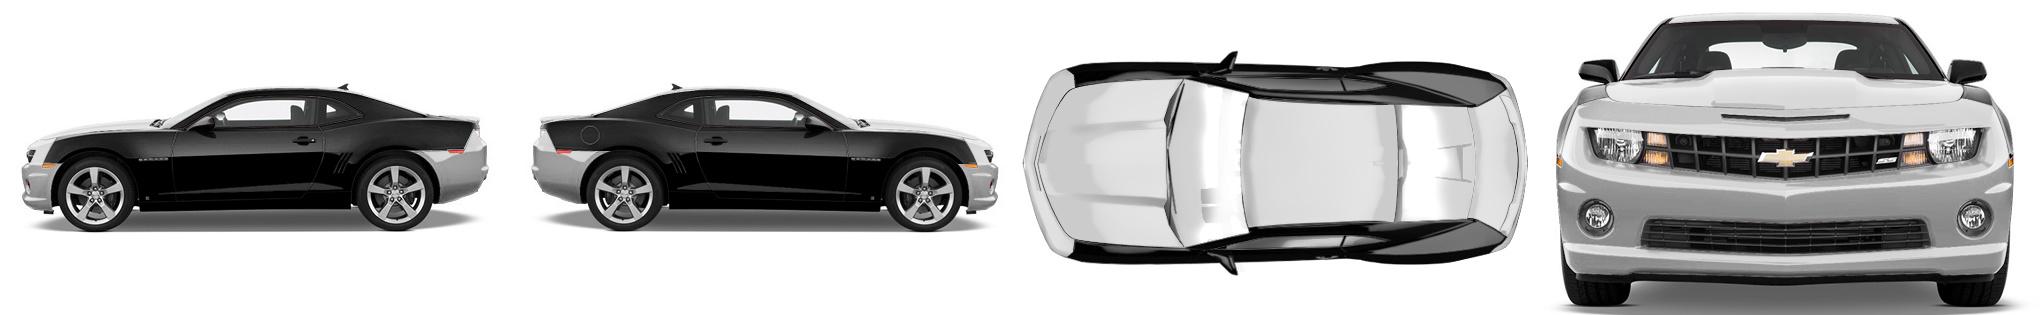 Muscle Car Wrap #47168